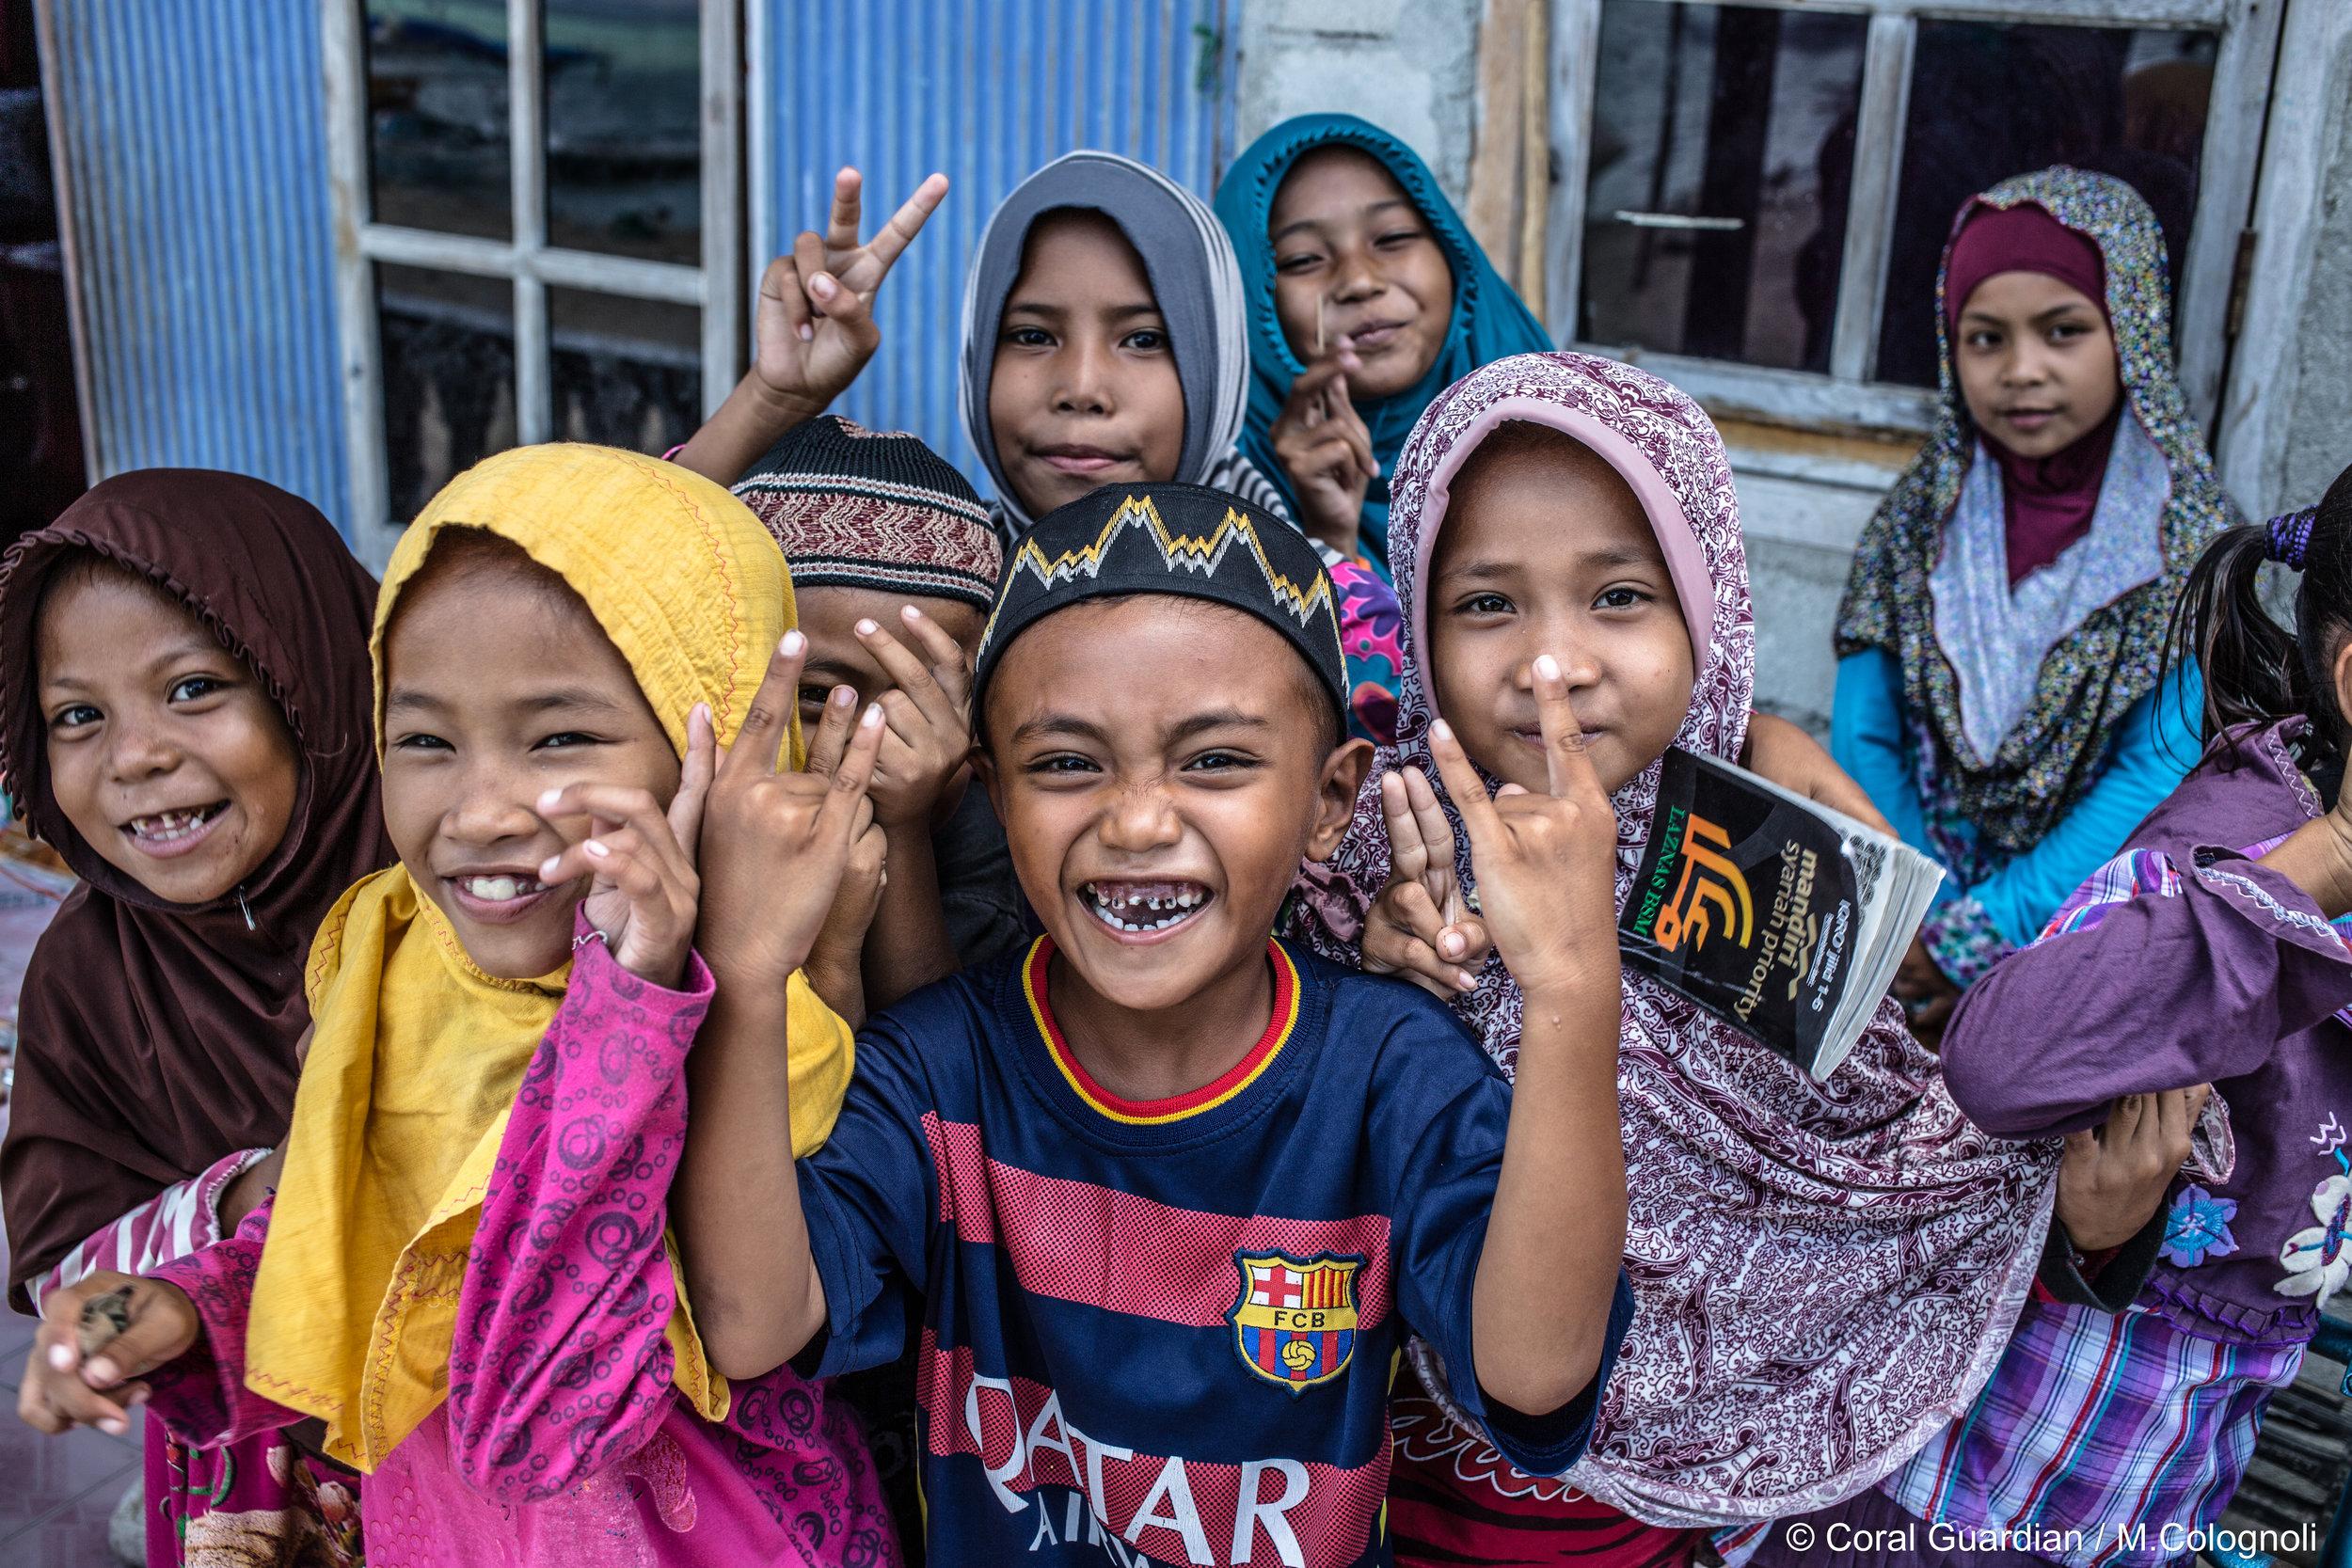 18 - Children of the reef, the future of Seraya-besar CREDIT: MArtin COLOGNOLI